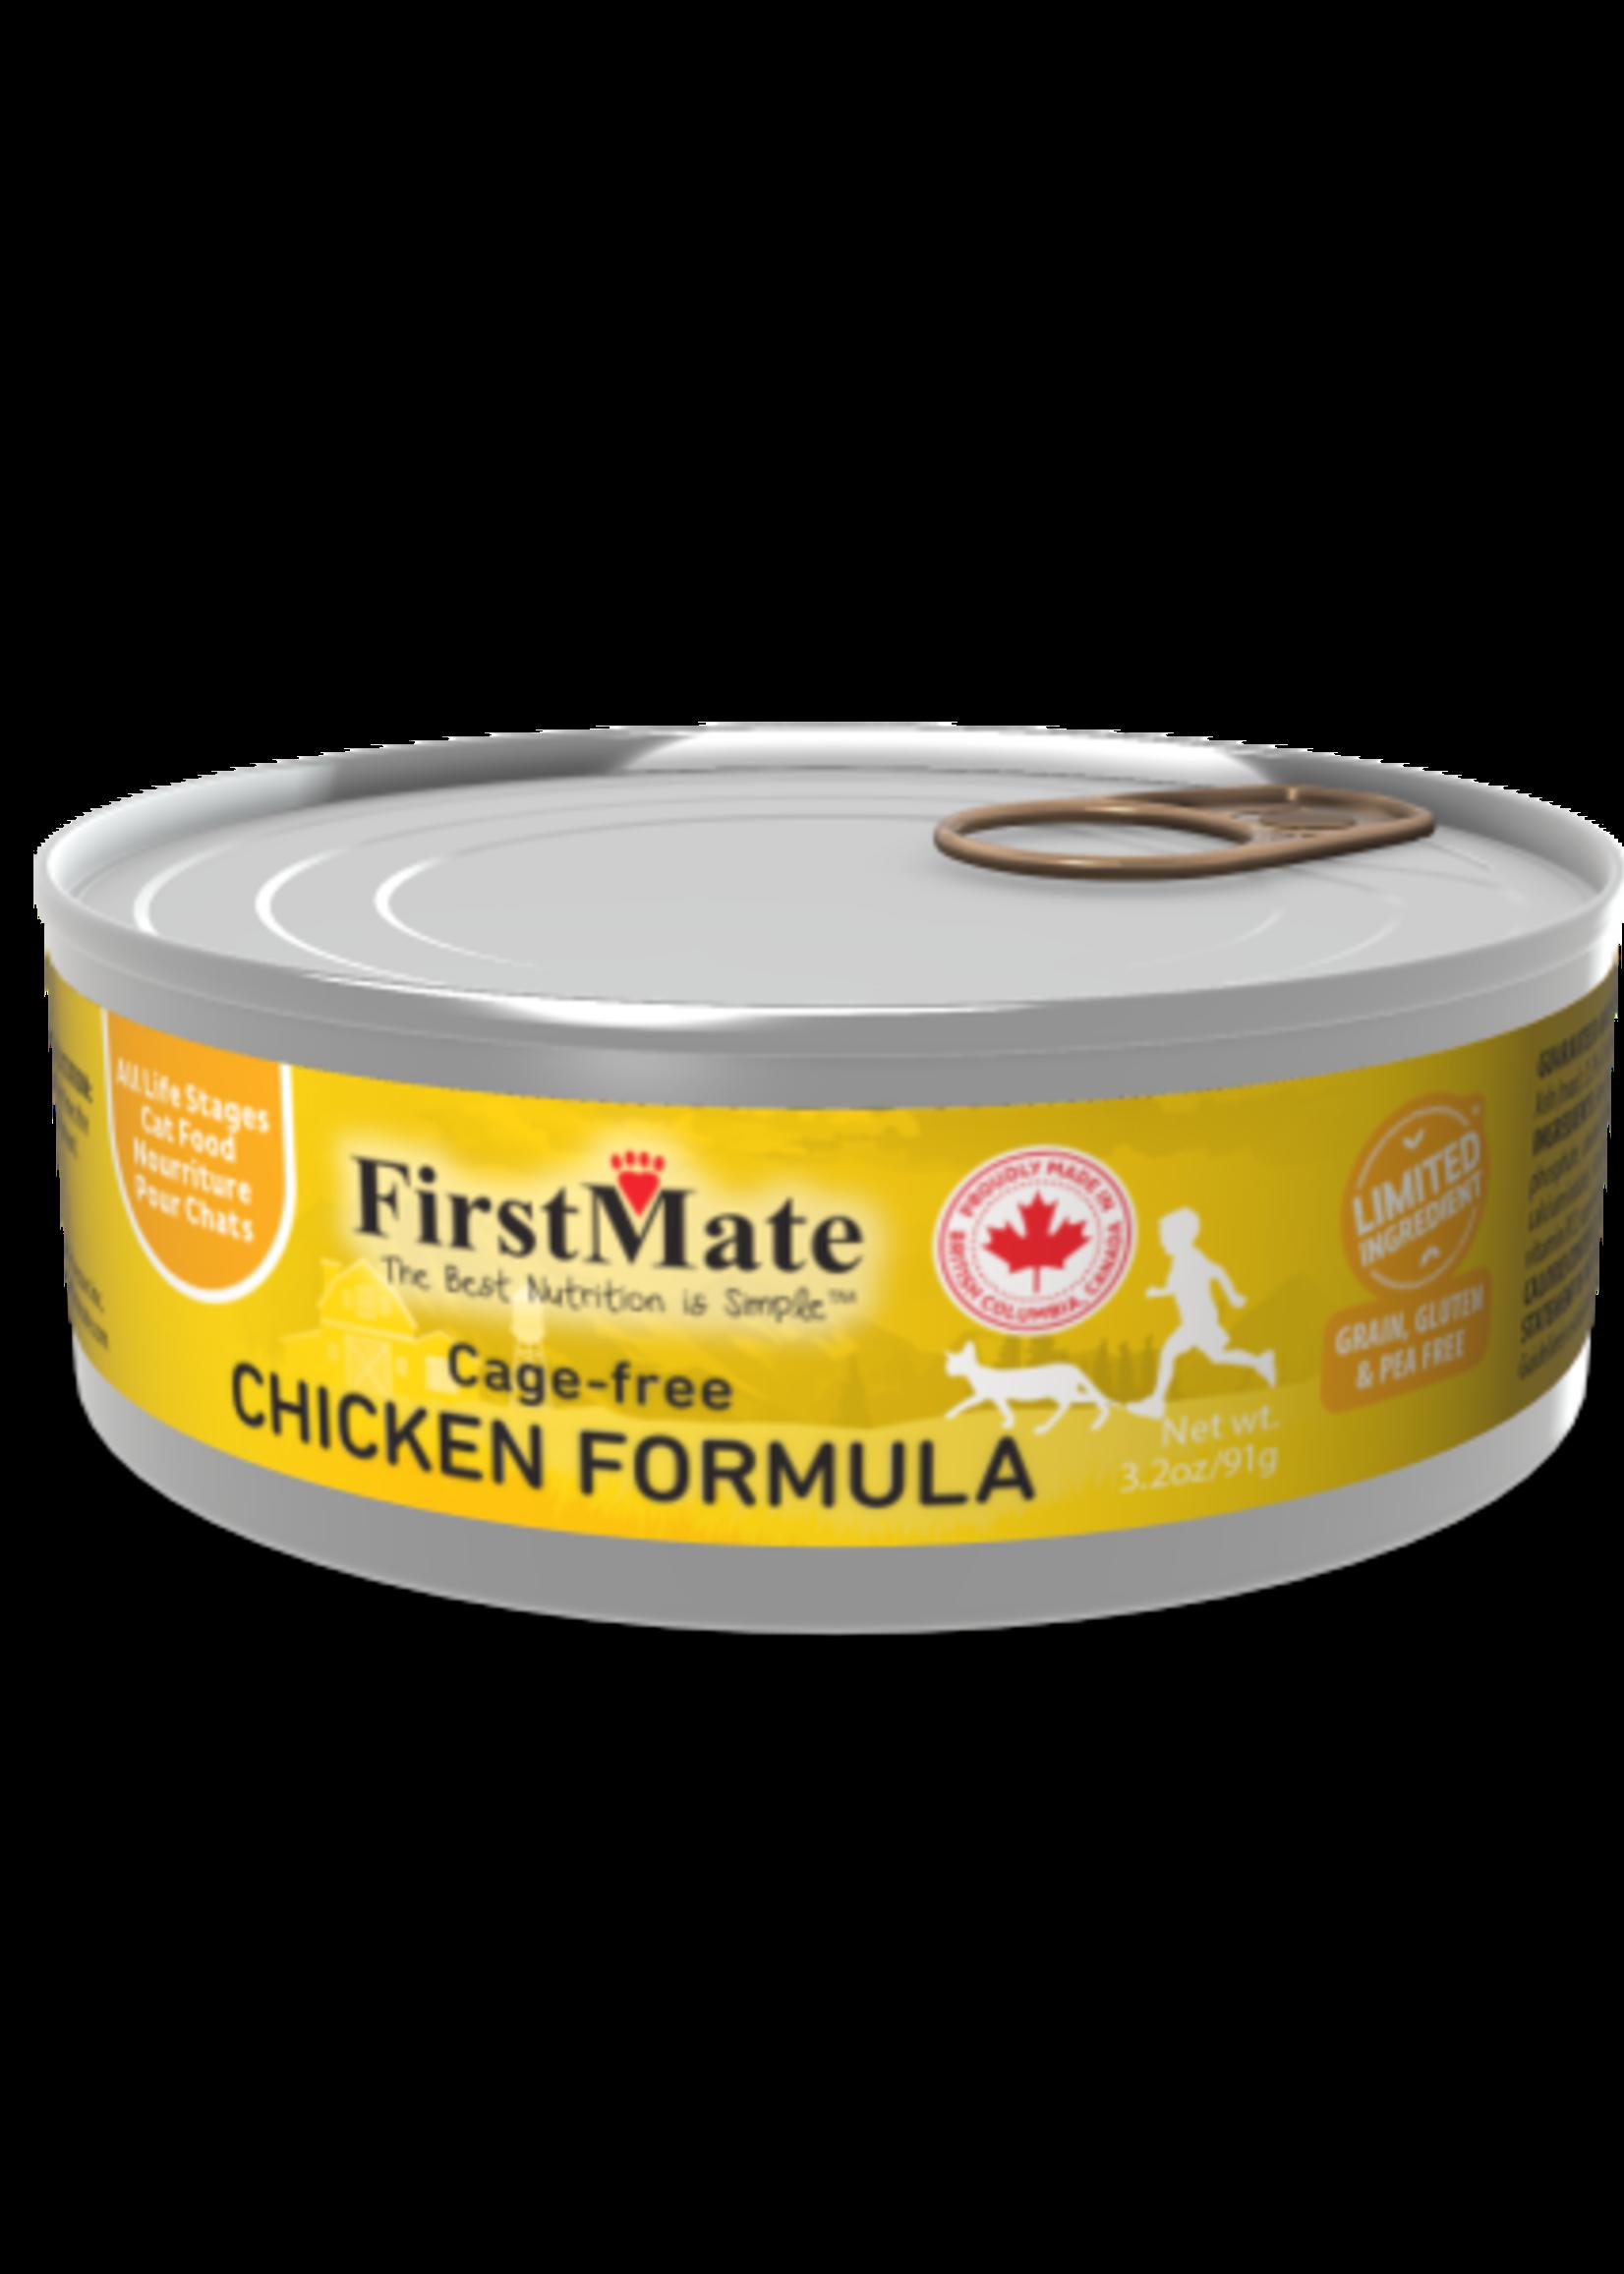 First Mate FirstMate Cat Free Run Chicken 5.5oz